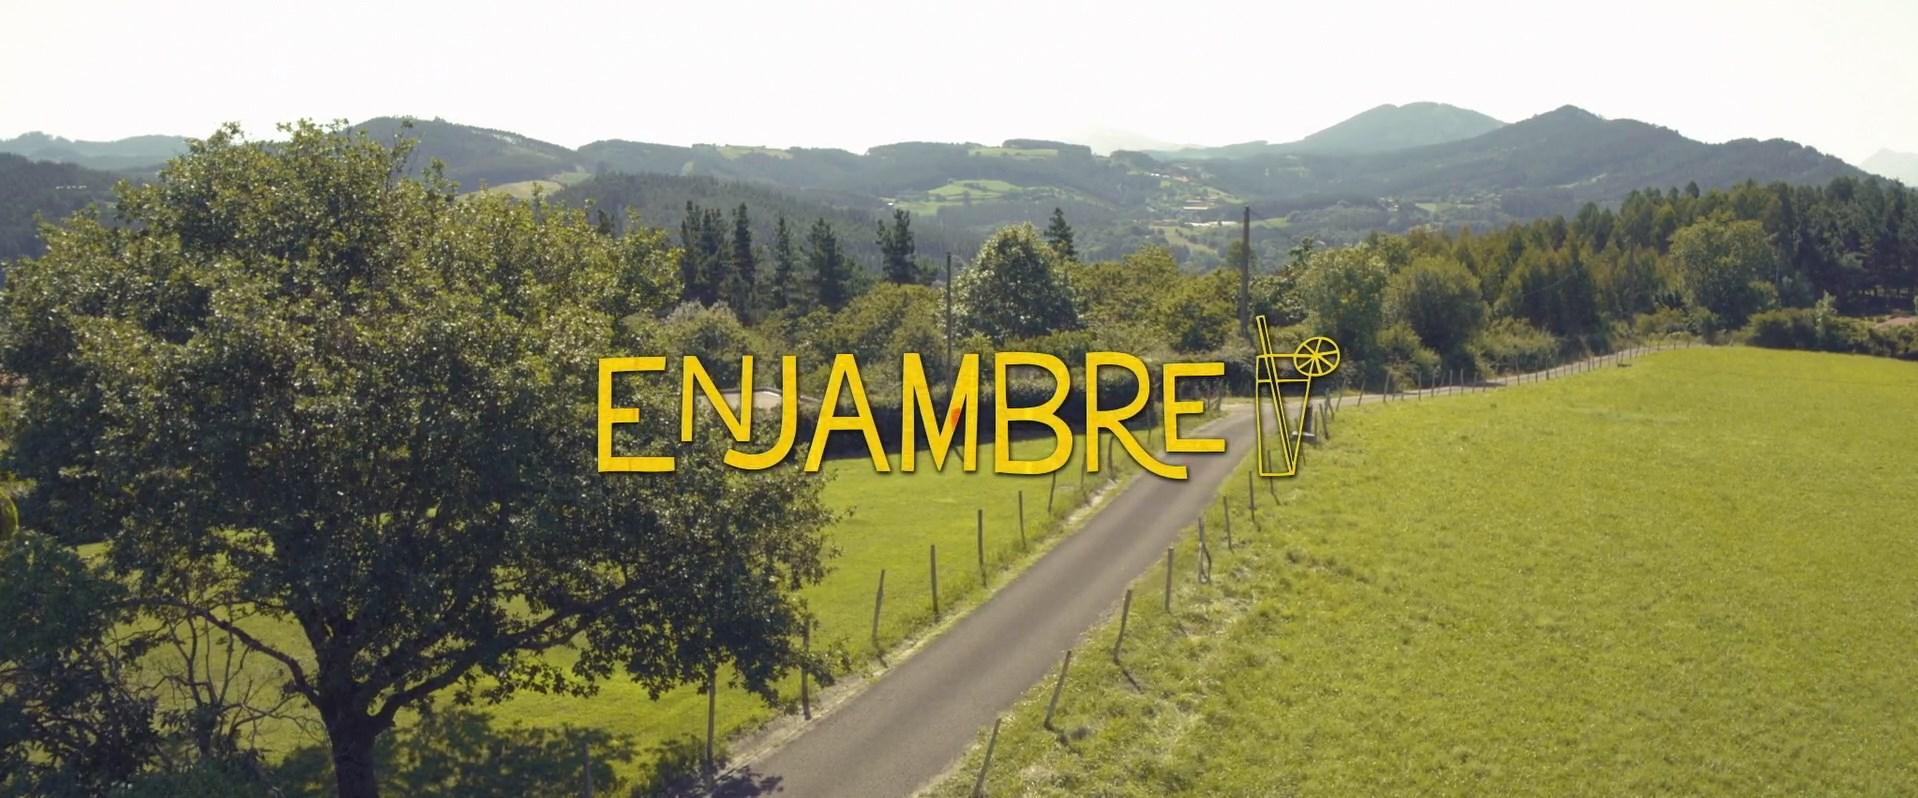 Enjambre (2020) 1080p WEB-DL